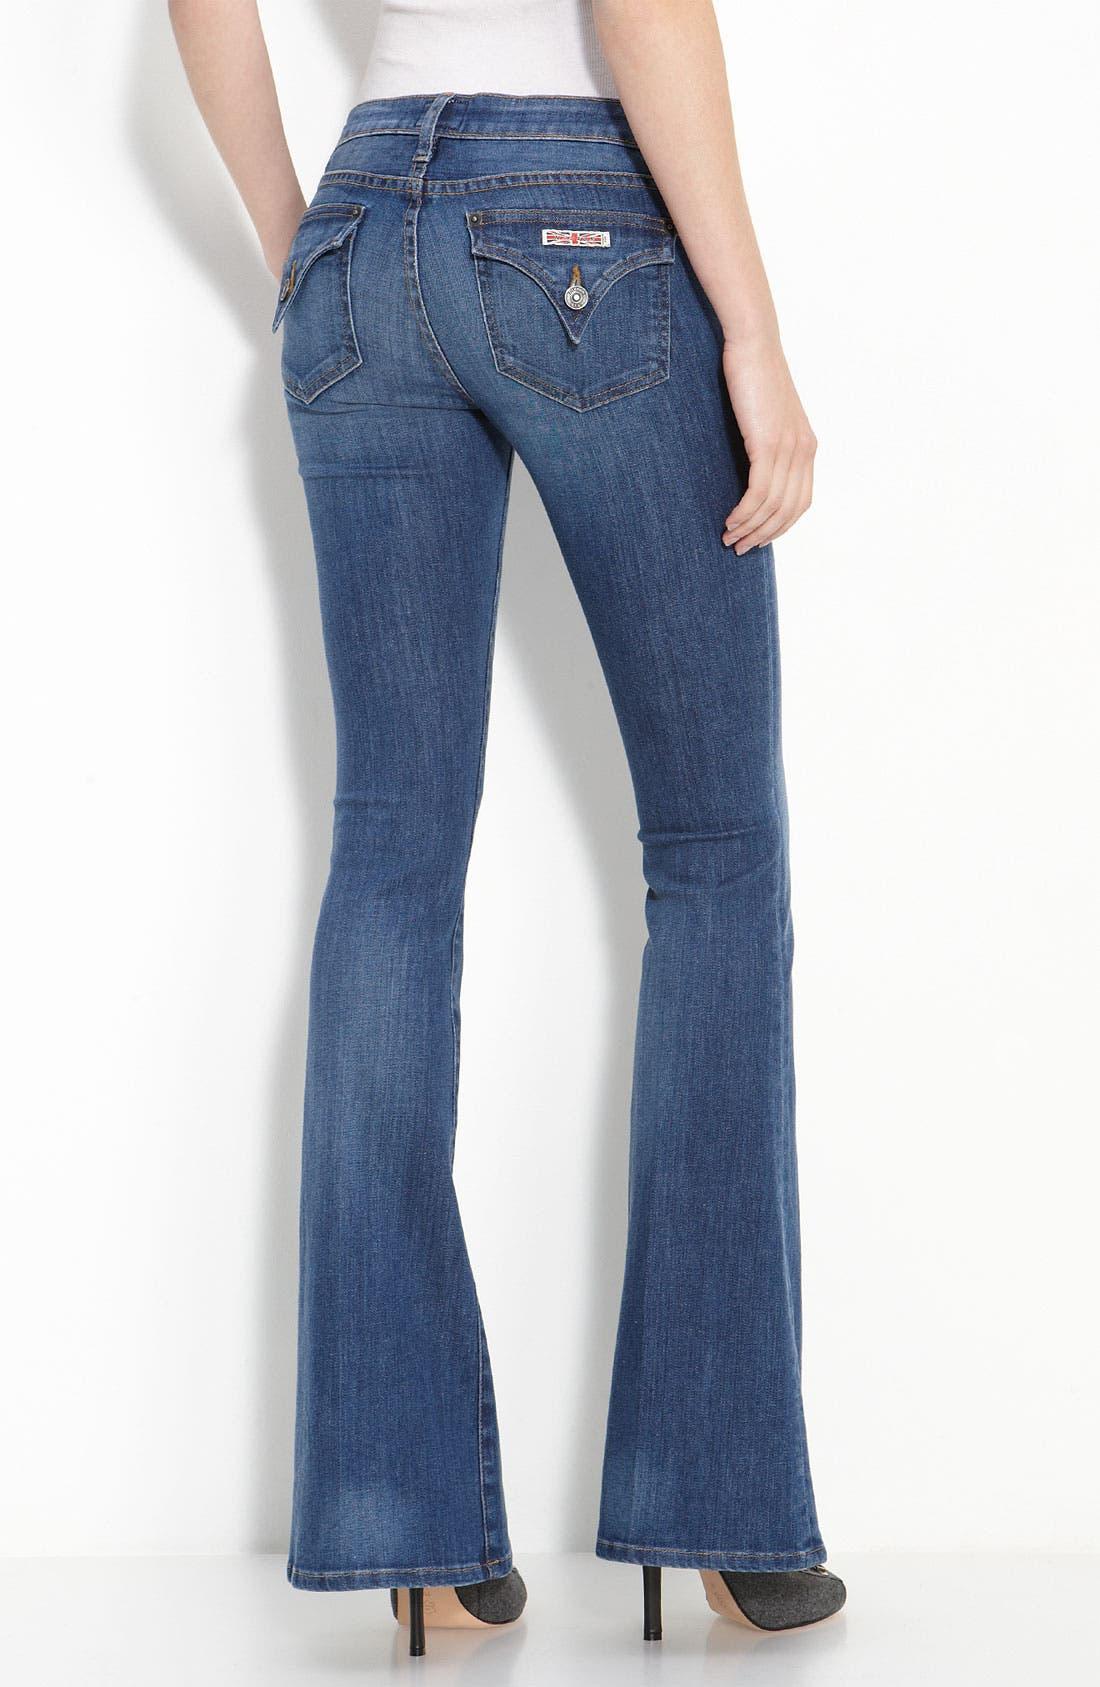 HUDSON JEANS,                             'Ferris' Flare Leg Stretch Denim Jeans,                             Alternate thumbnail 2, color,                             401